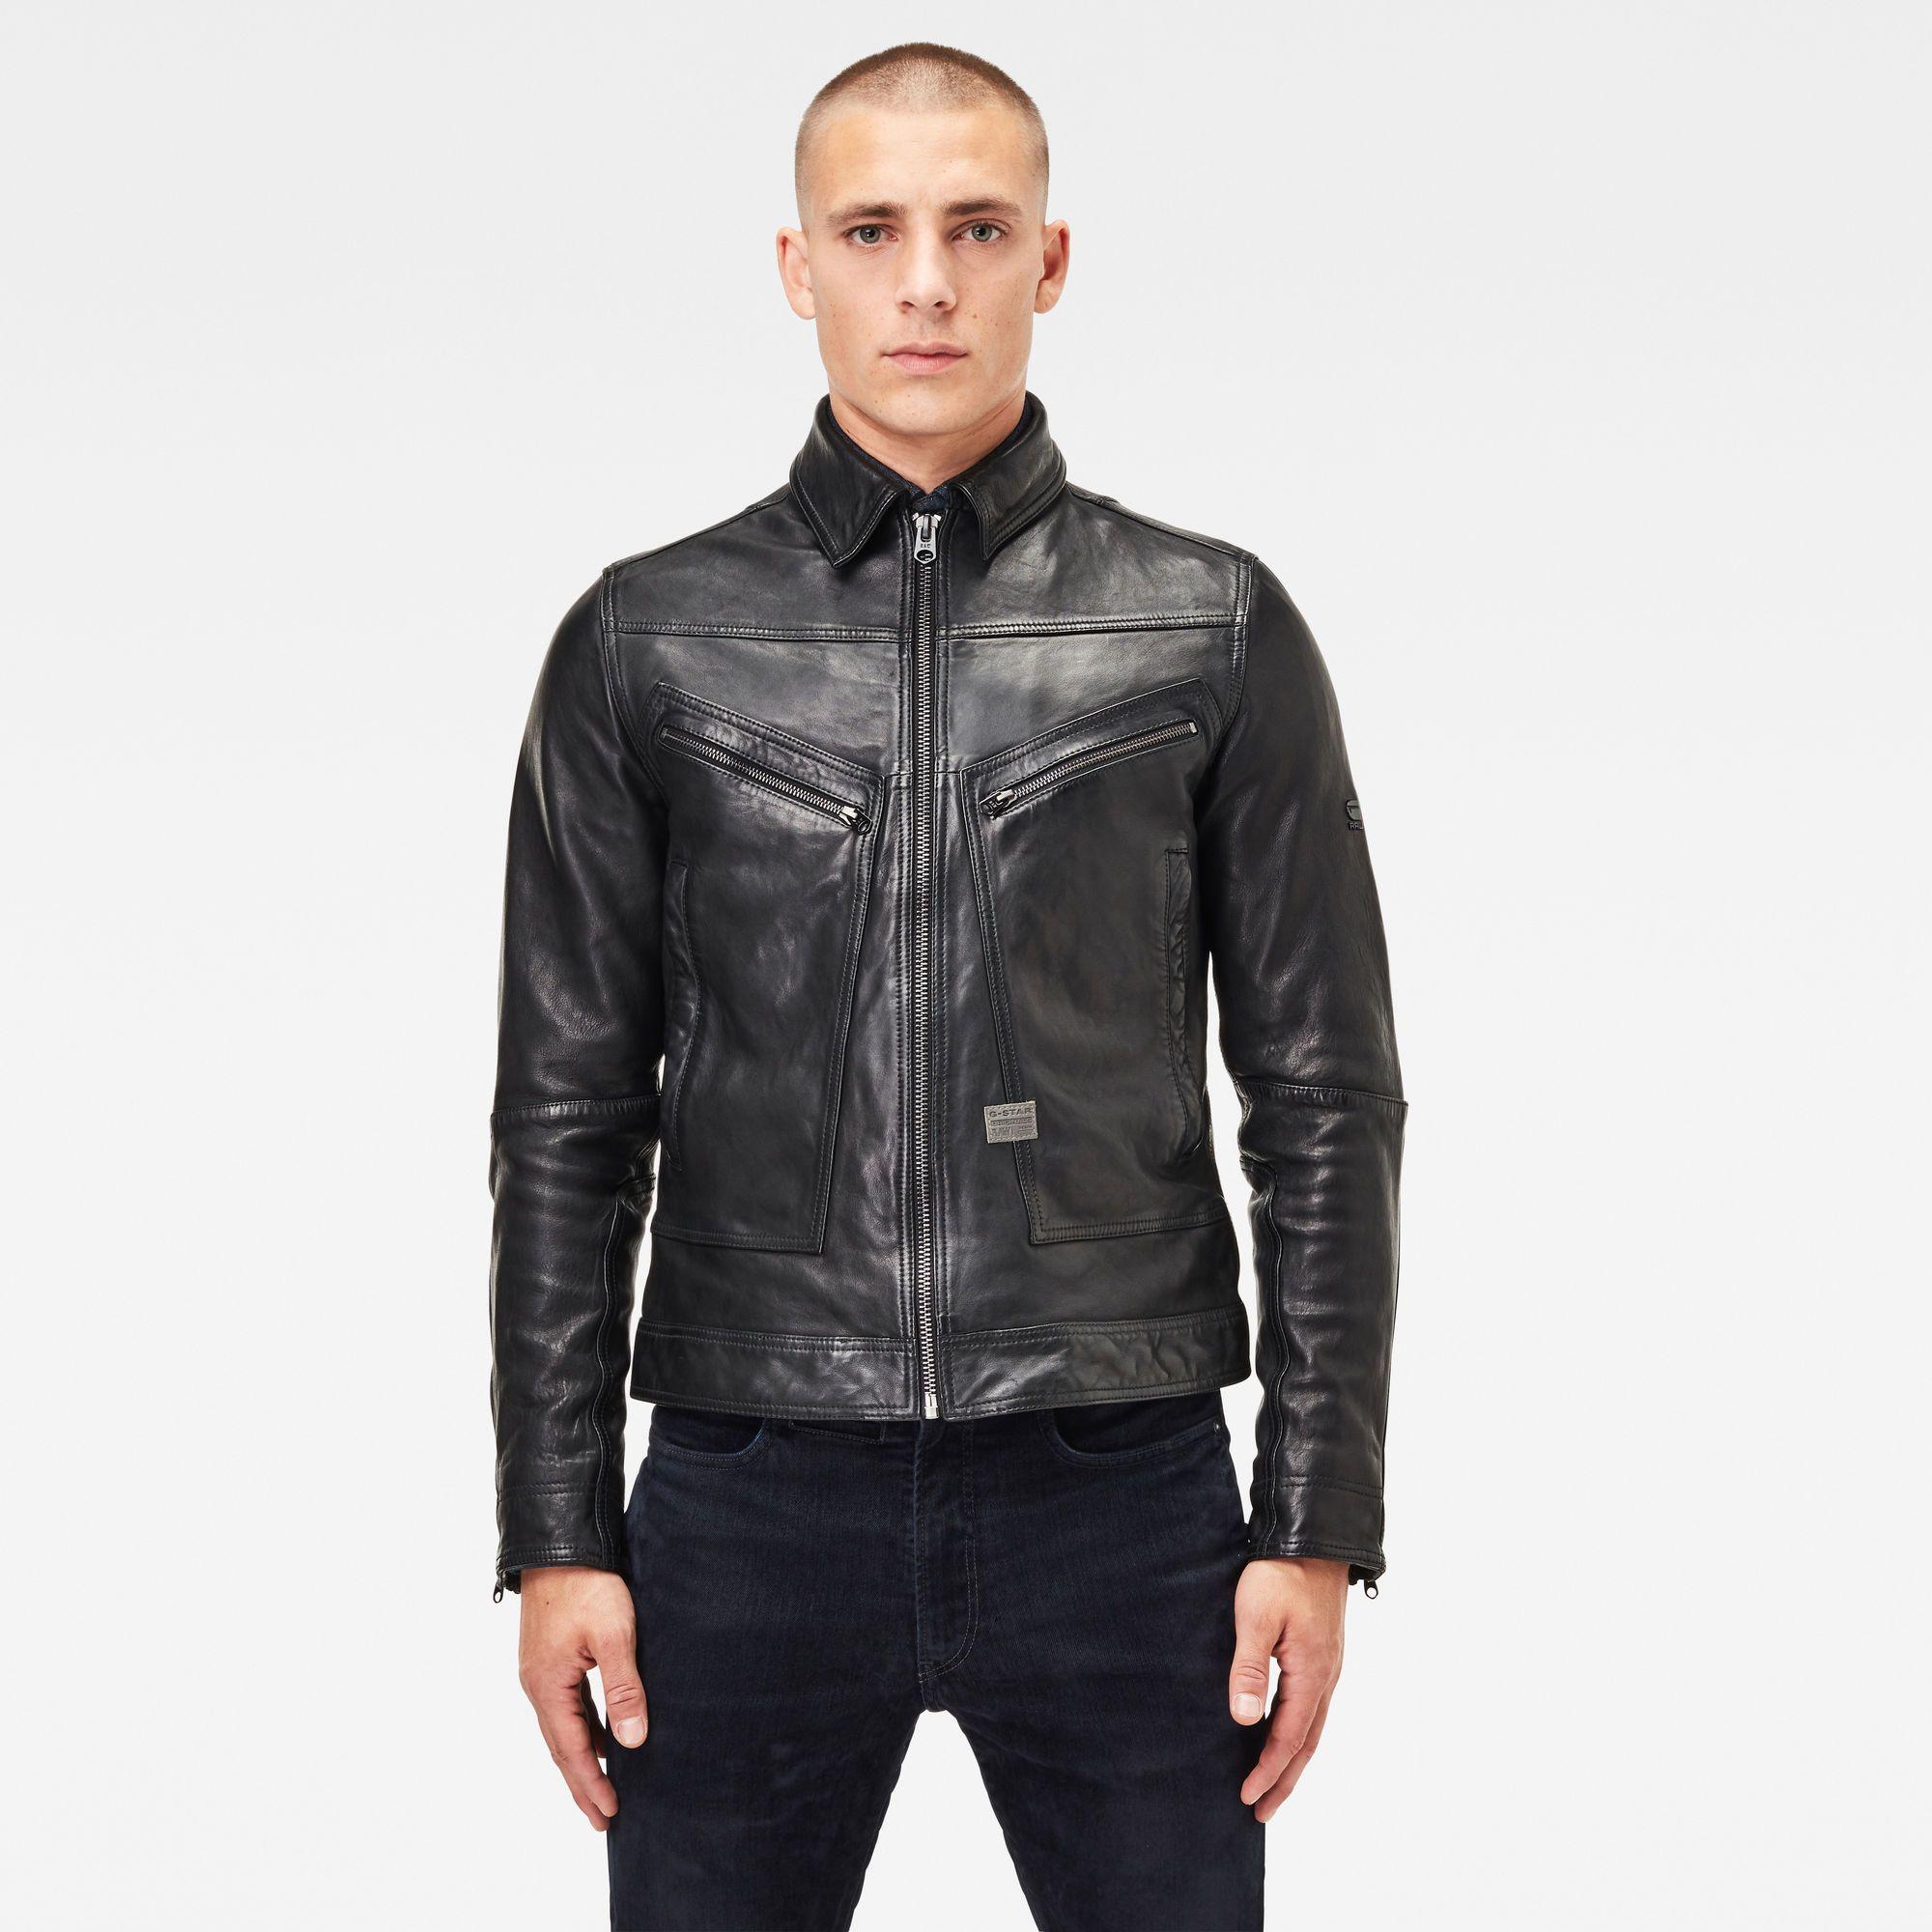 Air Force Lederen Jack Dark Black G Star Raw In 2021 Leather Jacket Leather Jacket Men Jackets [ 2000 x 2000 Pixel ]